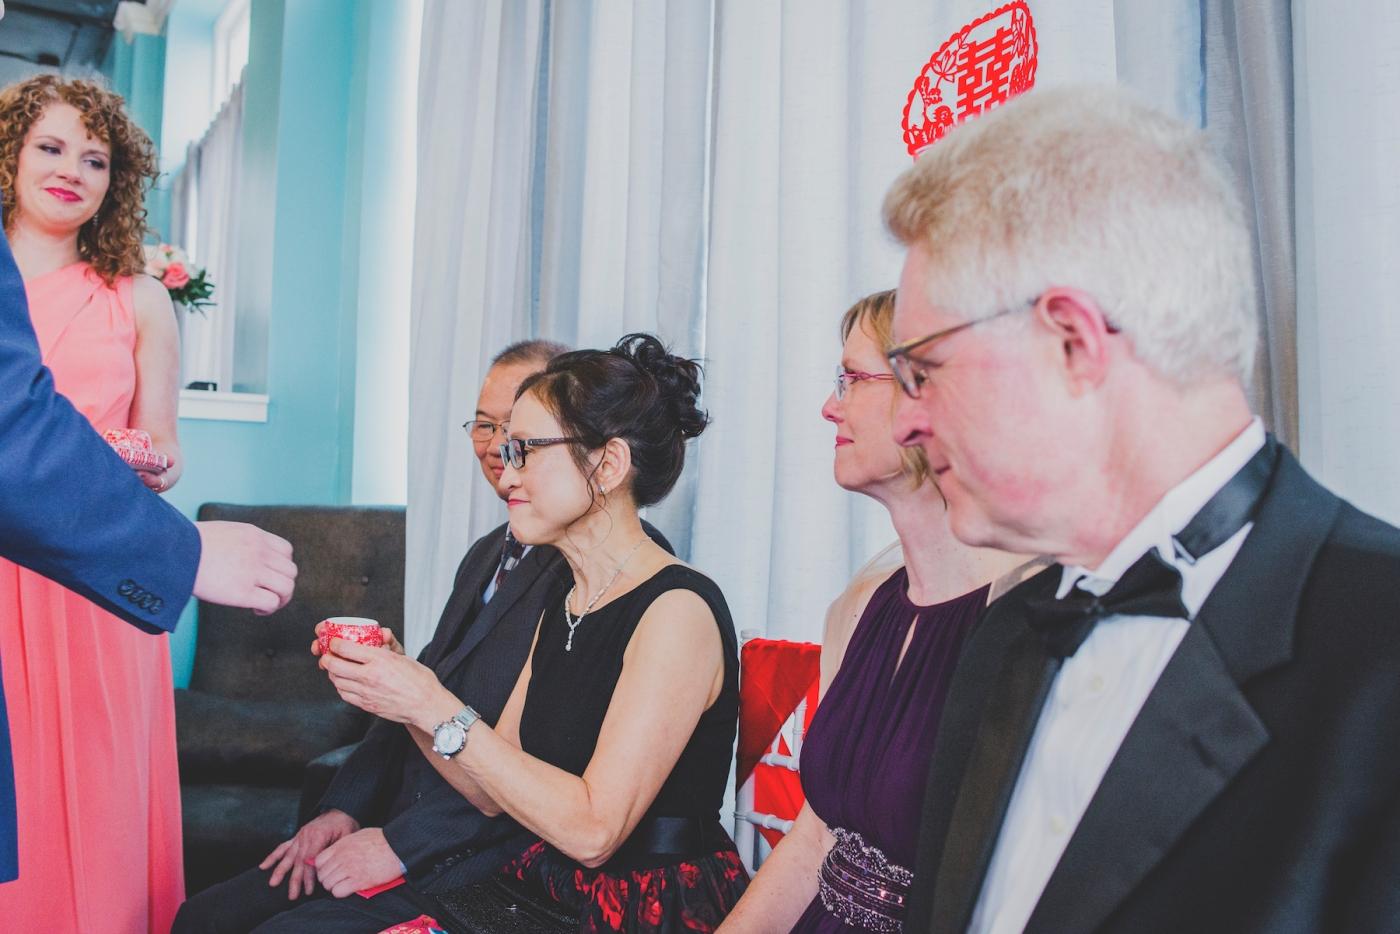 DSC_2957Everett_Wedding_Ballroom_Jane_Speleers_photography_Rachel_and_Edmund_teaceremony_2017